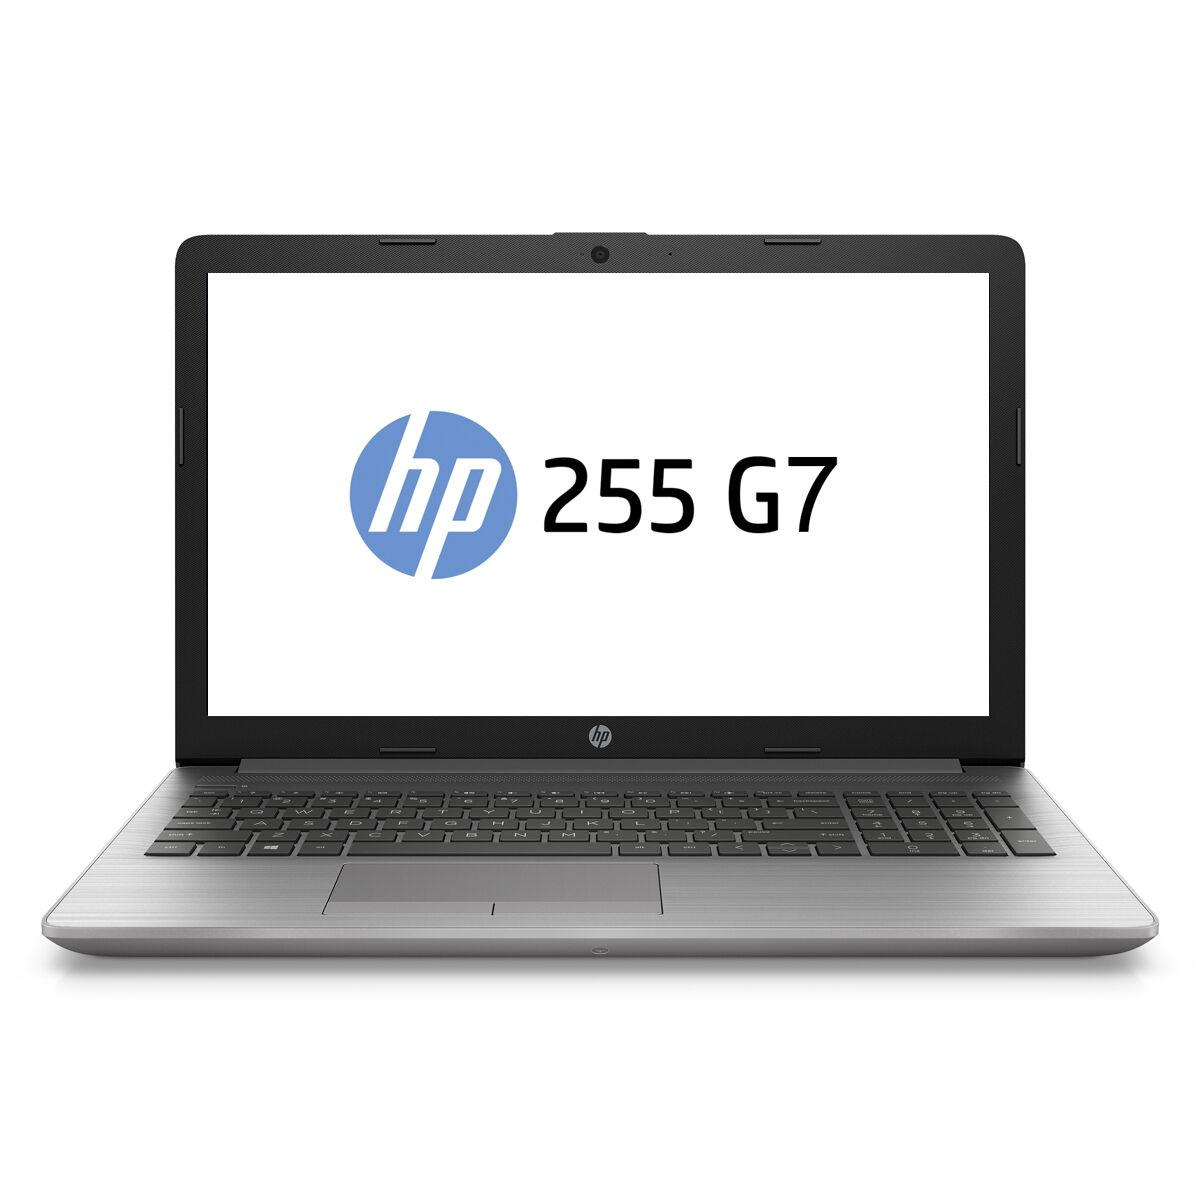 "HP 255 G7 (AMD Ryzen 5-3500U/8 GB RAM/256 GB SSD/15,6"" FHD/Win 10 Pro)"